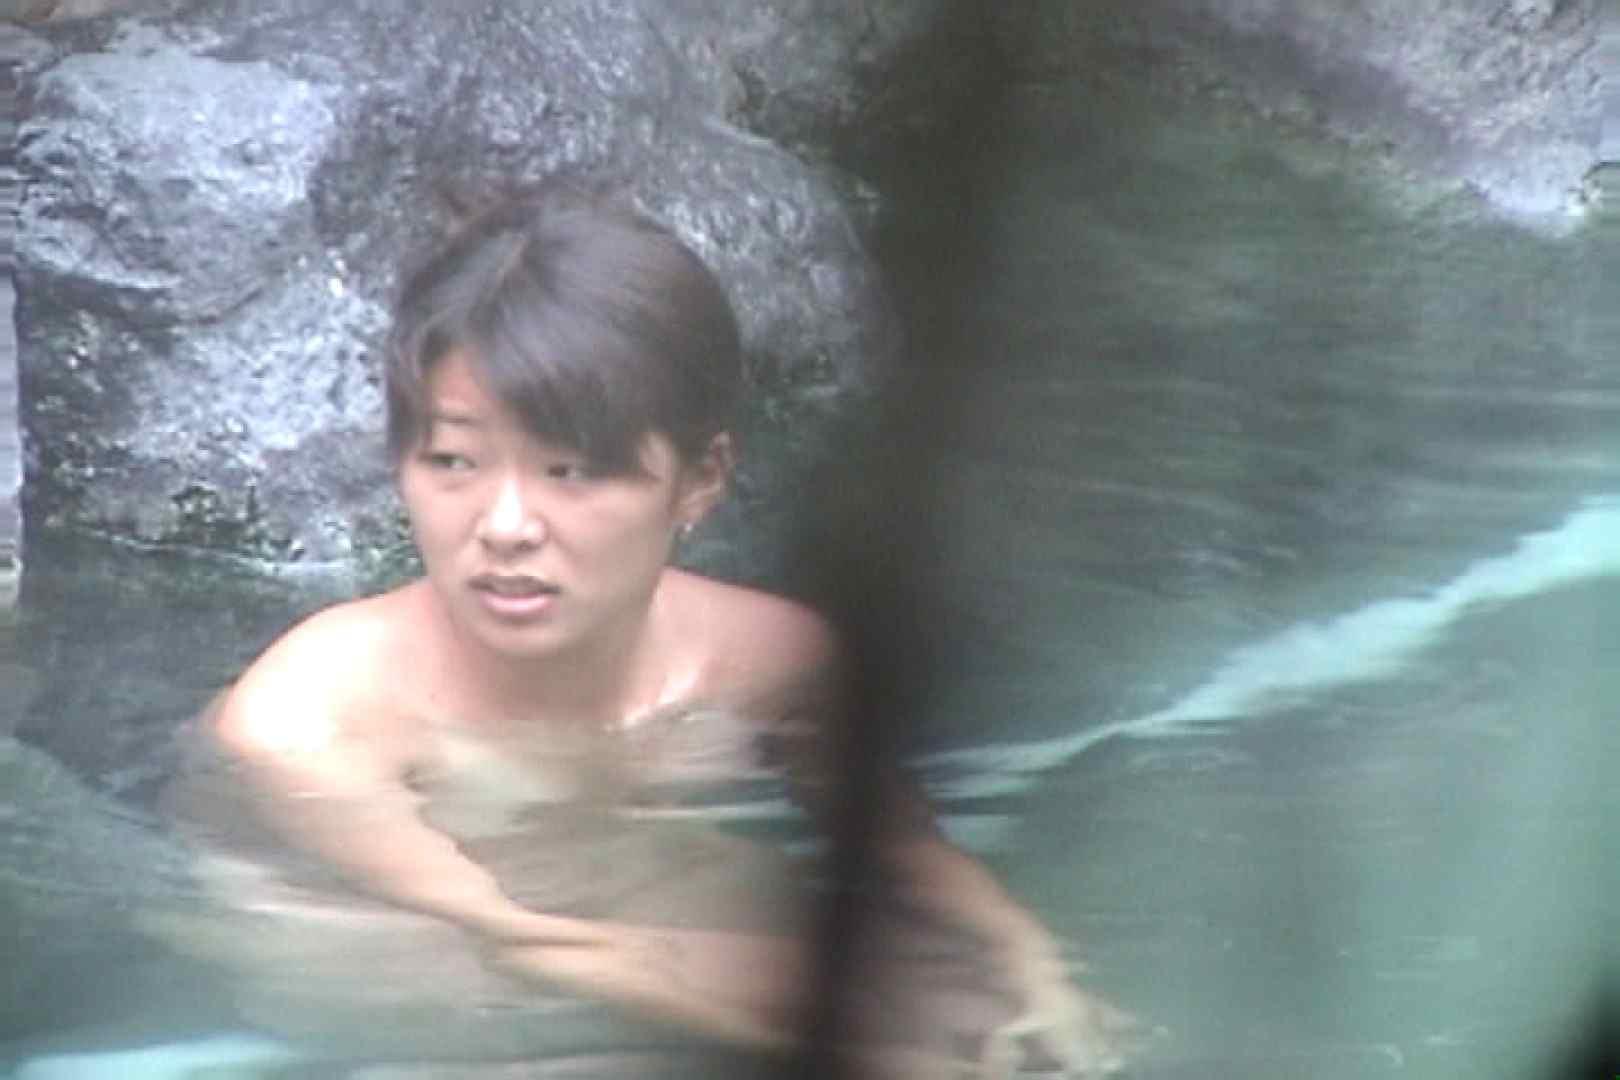 Aquaな露天風呂Vol.69【VIP限定】 盗撮 アダルト動画キャプチャ 106連発 35